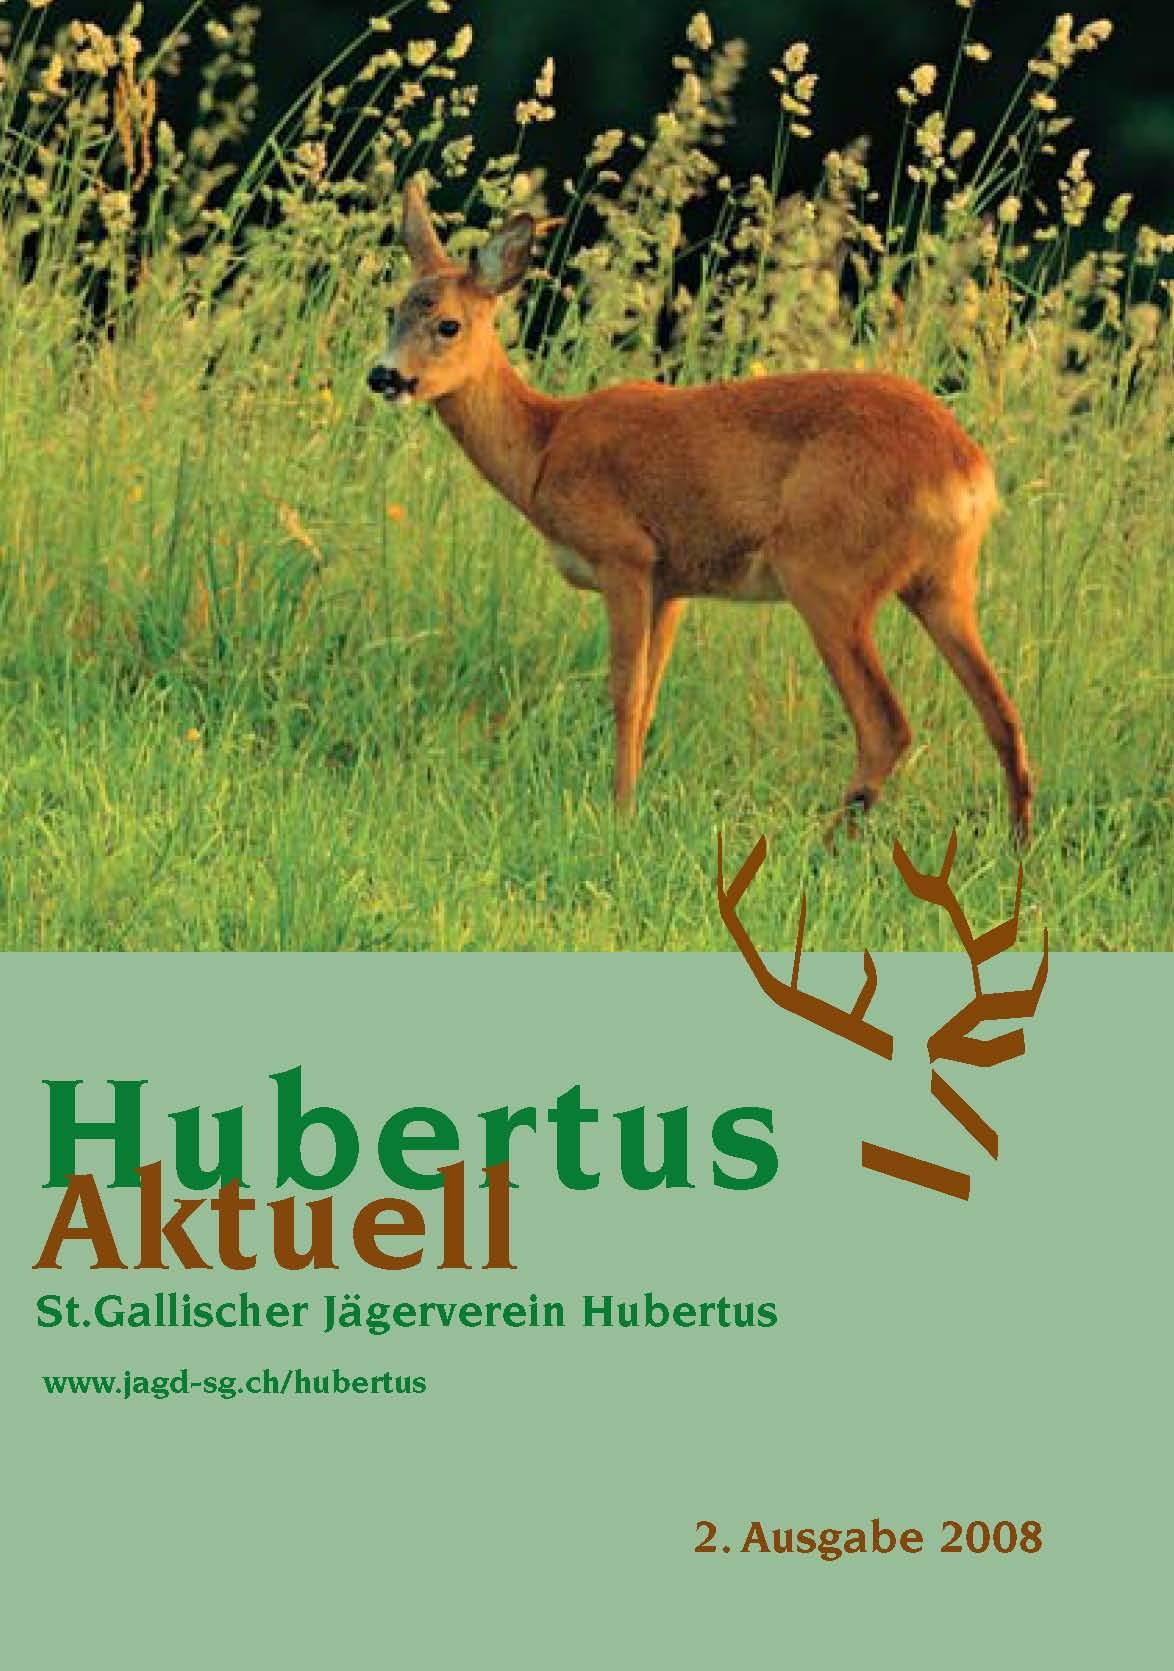 hubertus akutell 02 2008